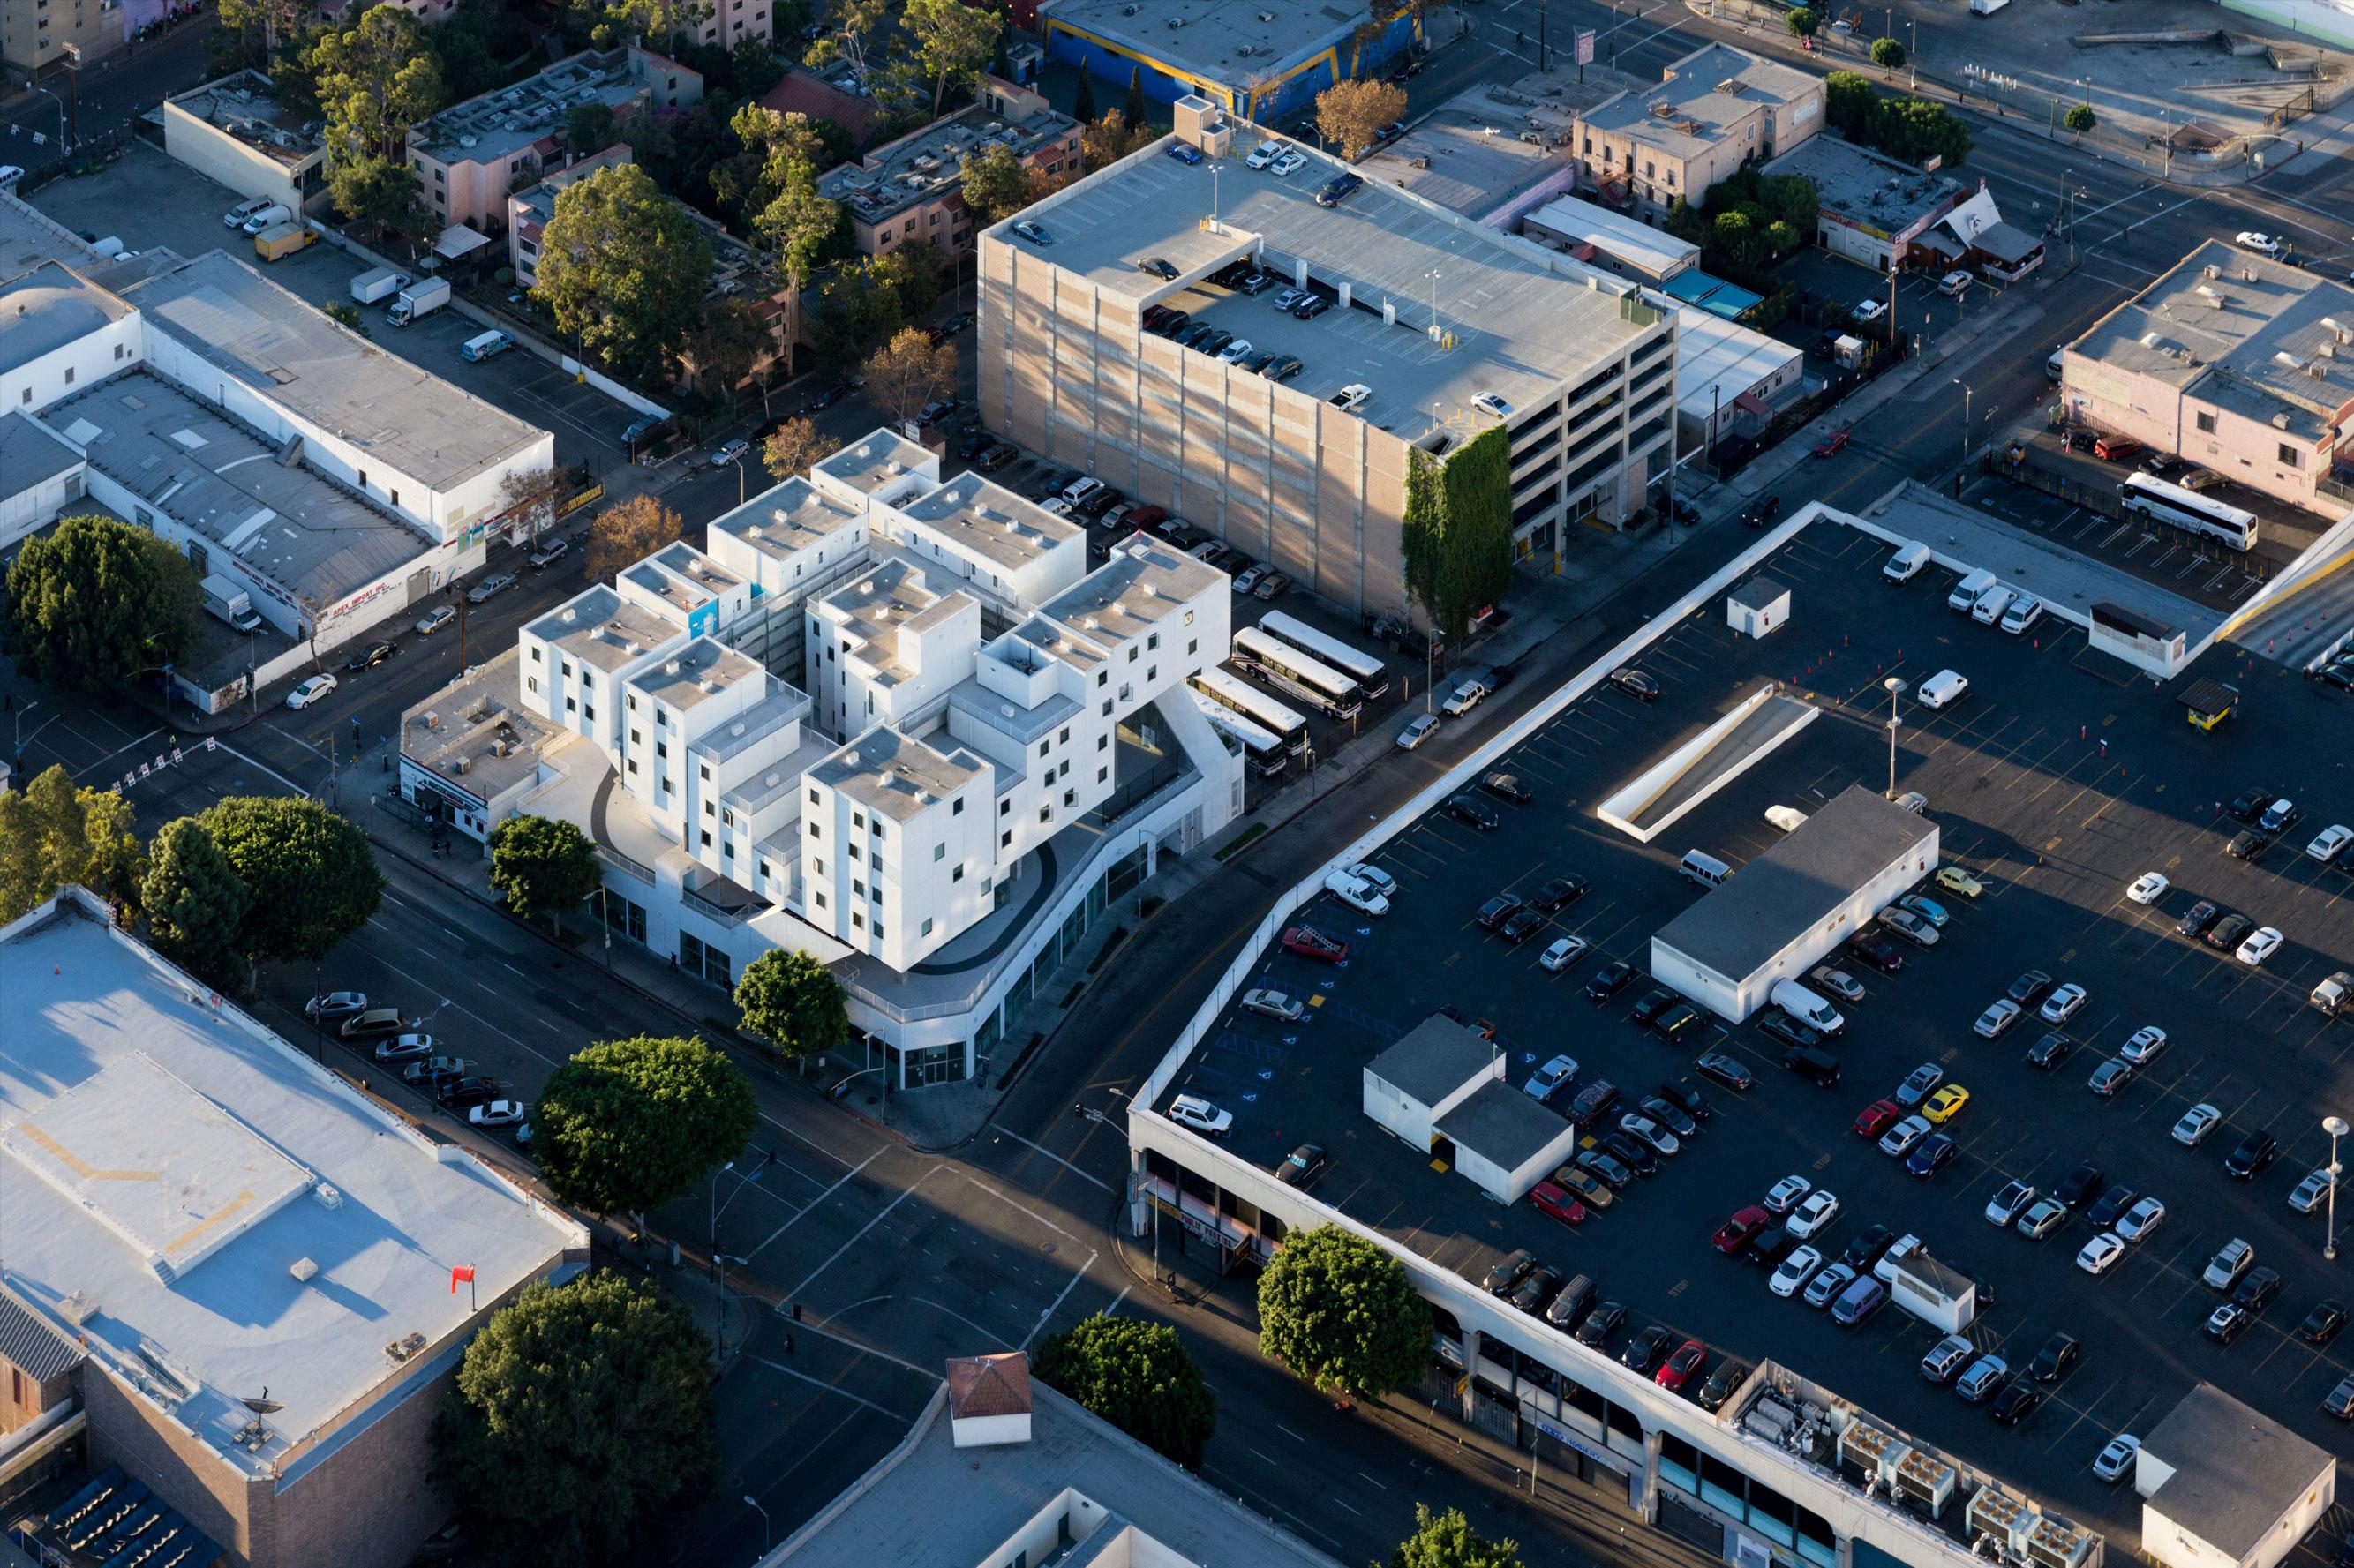 Star Apartments Los Angeles | asbackgammonsupplythe